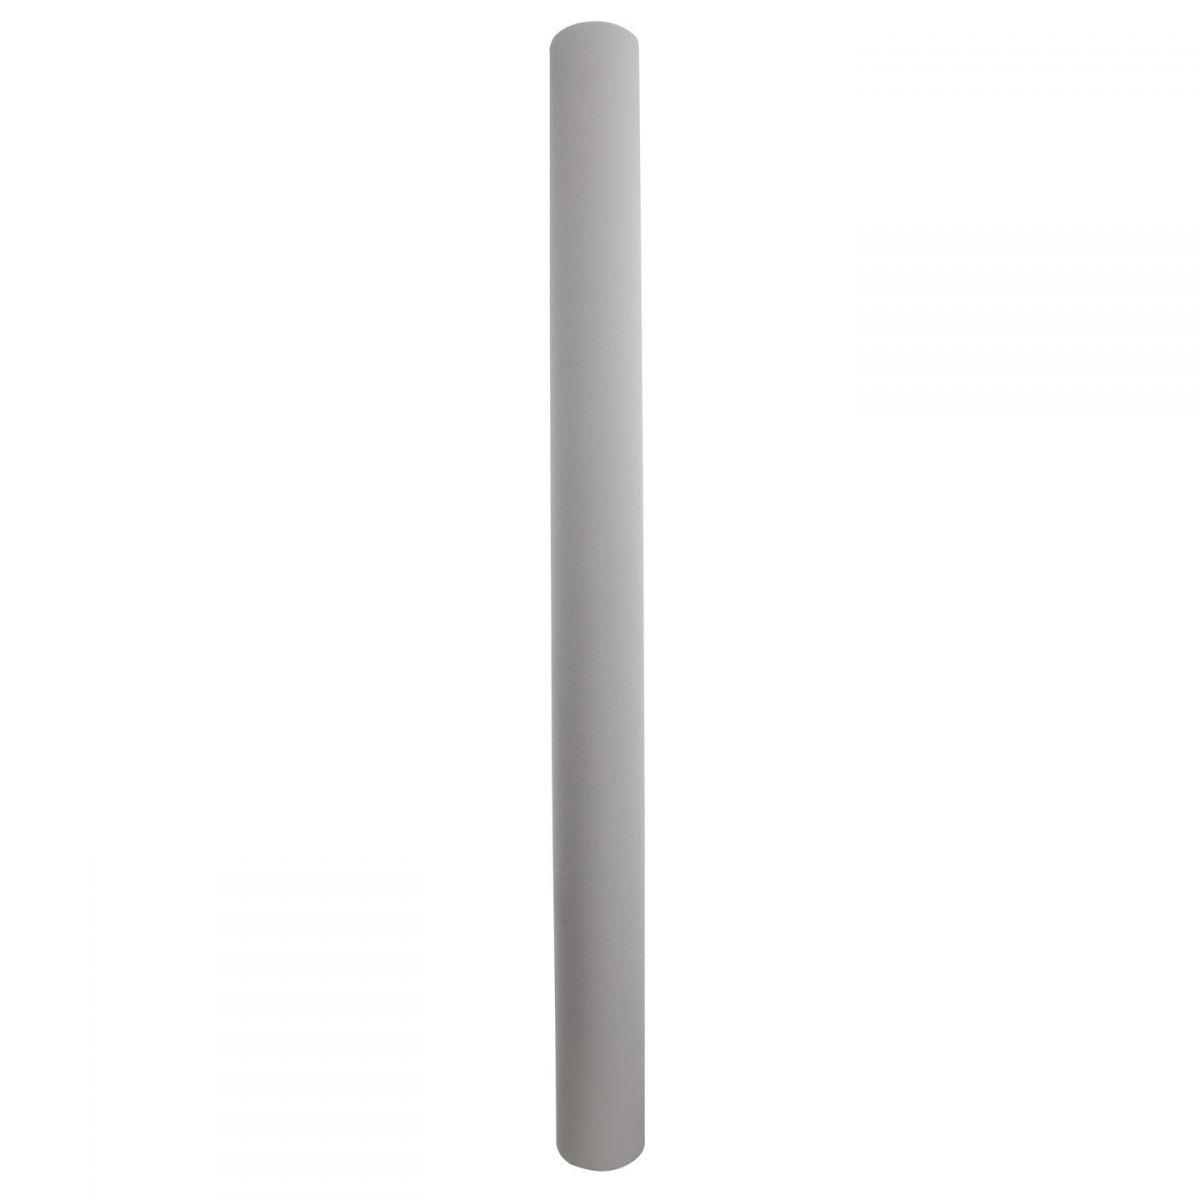 Elemento Filtrante PP Liso 30 X 2.1/2 PS10-30